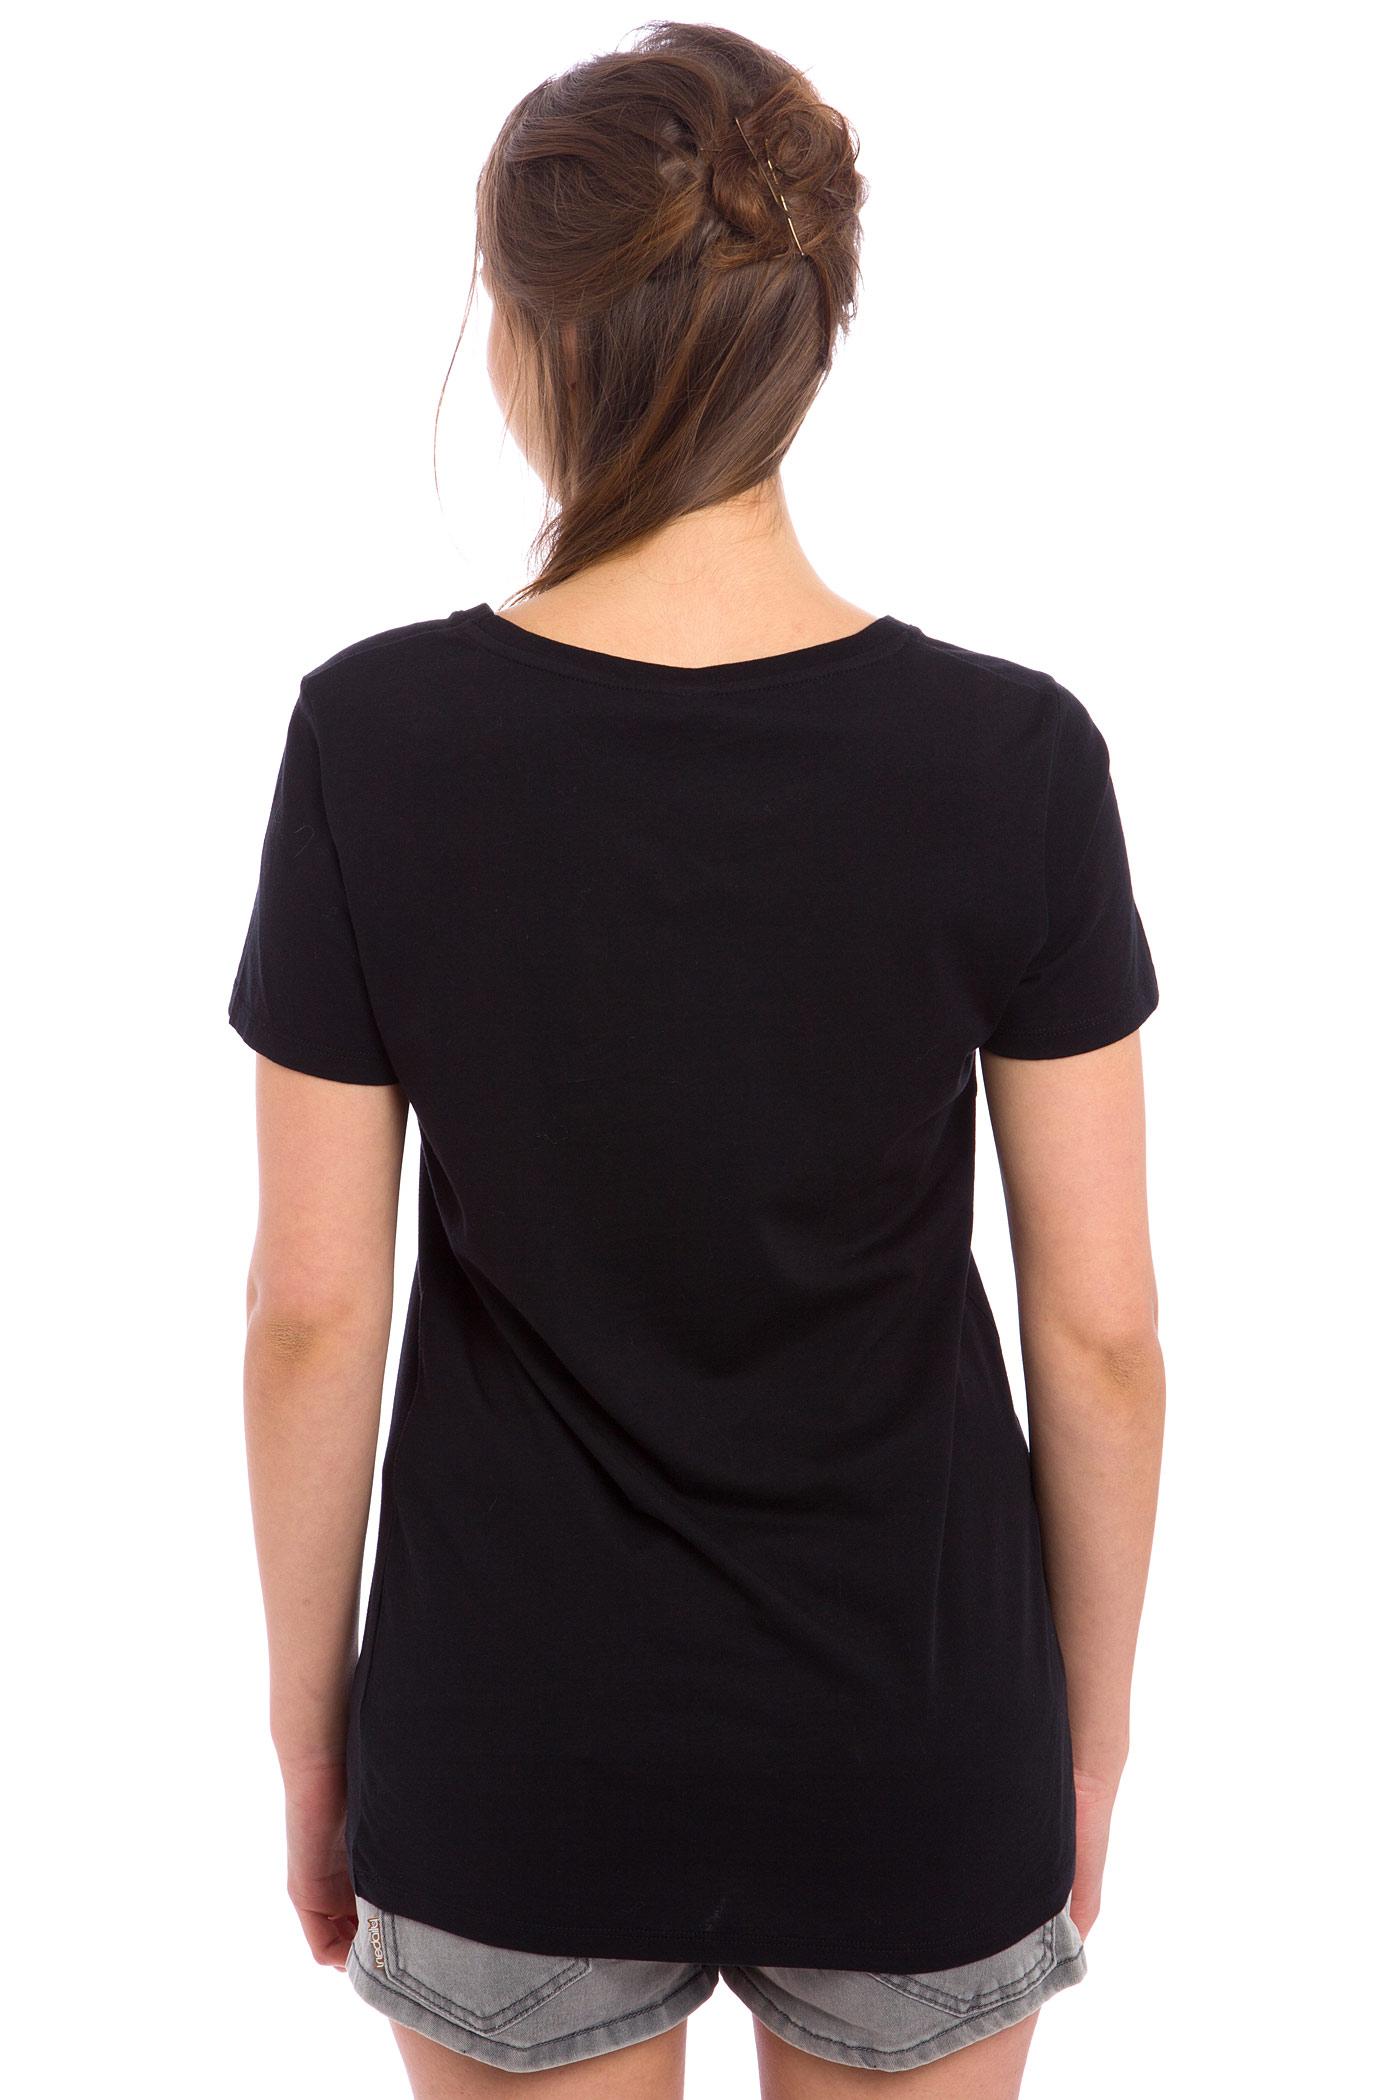 iriedaily loomy t shirt women black buy at skatedeluxe. Black Bedroom Furniture Sets. Home Design Ideas